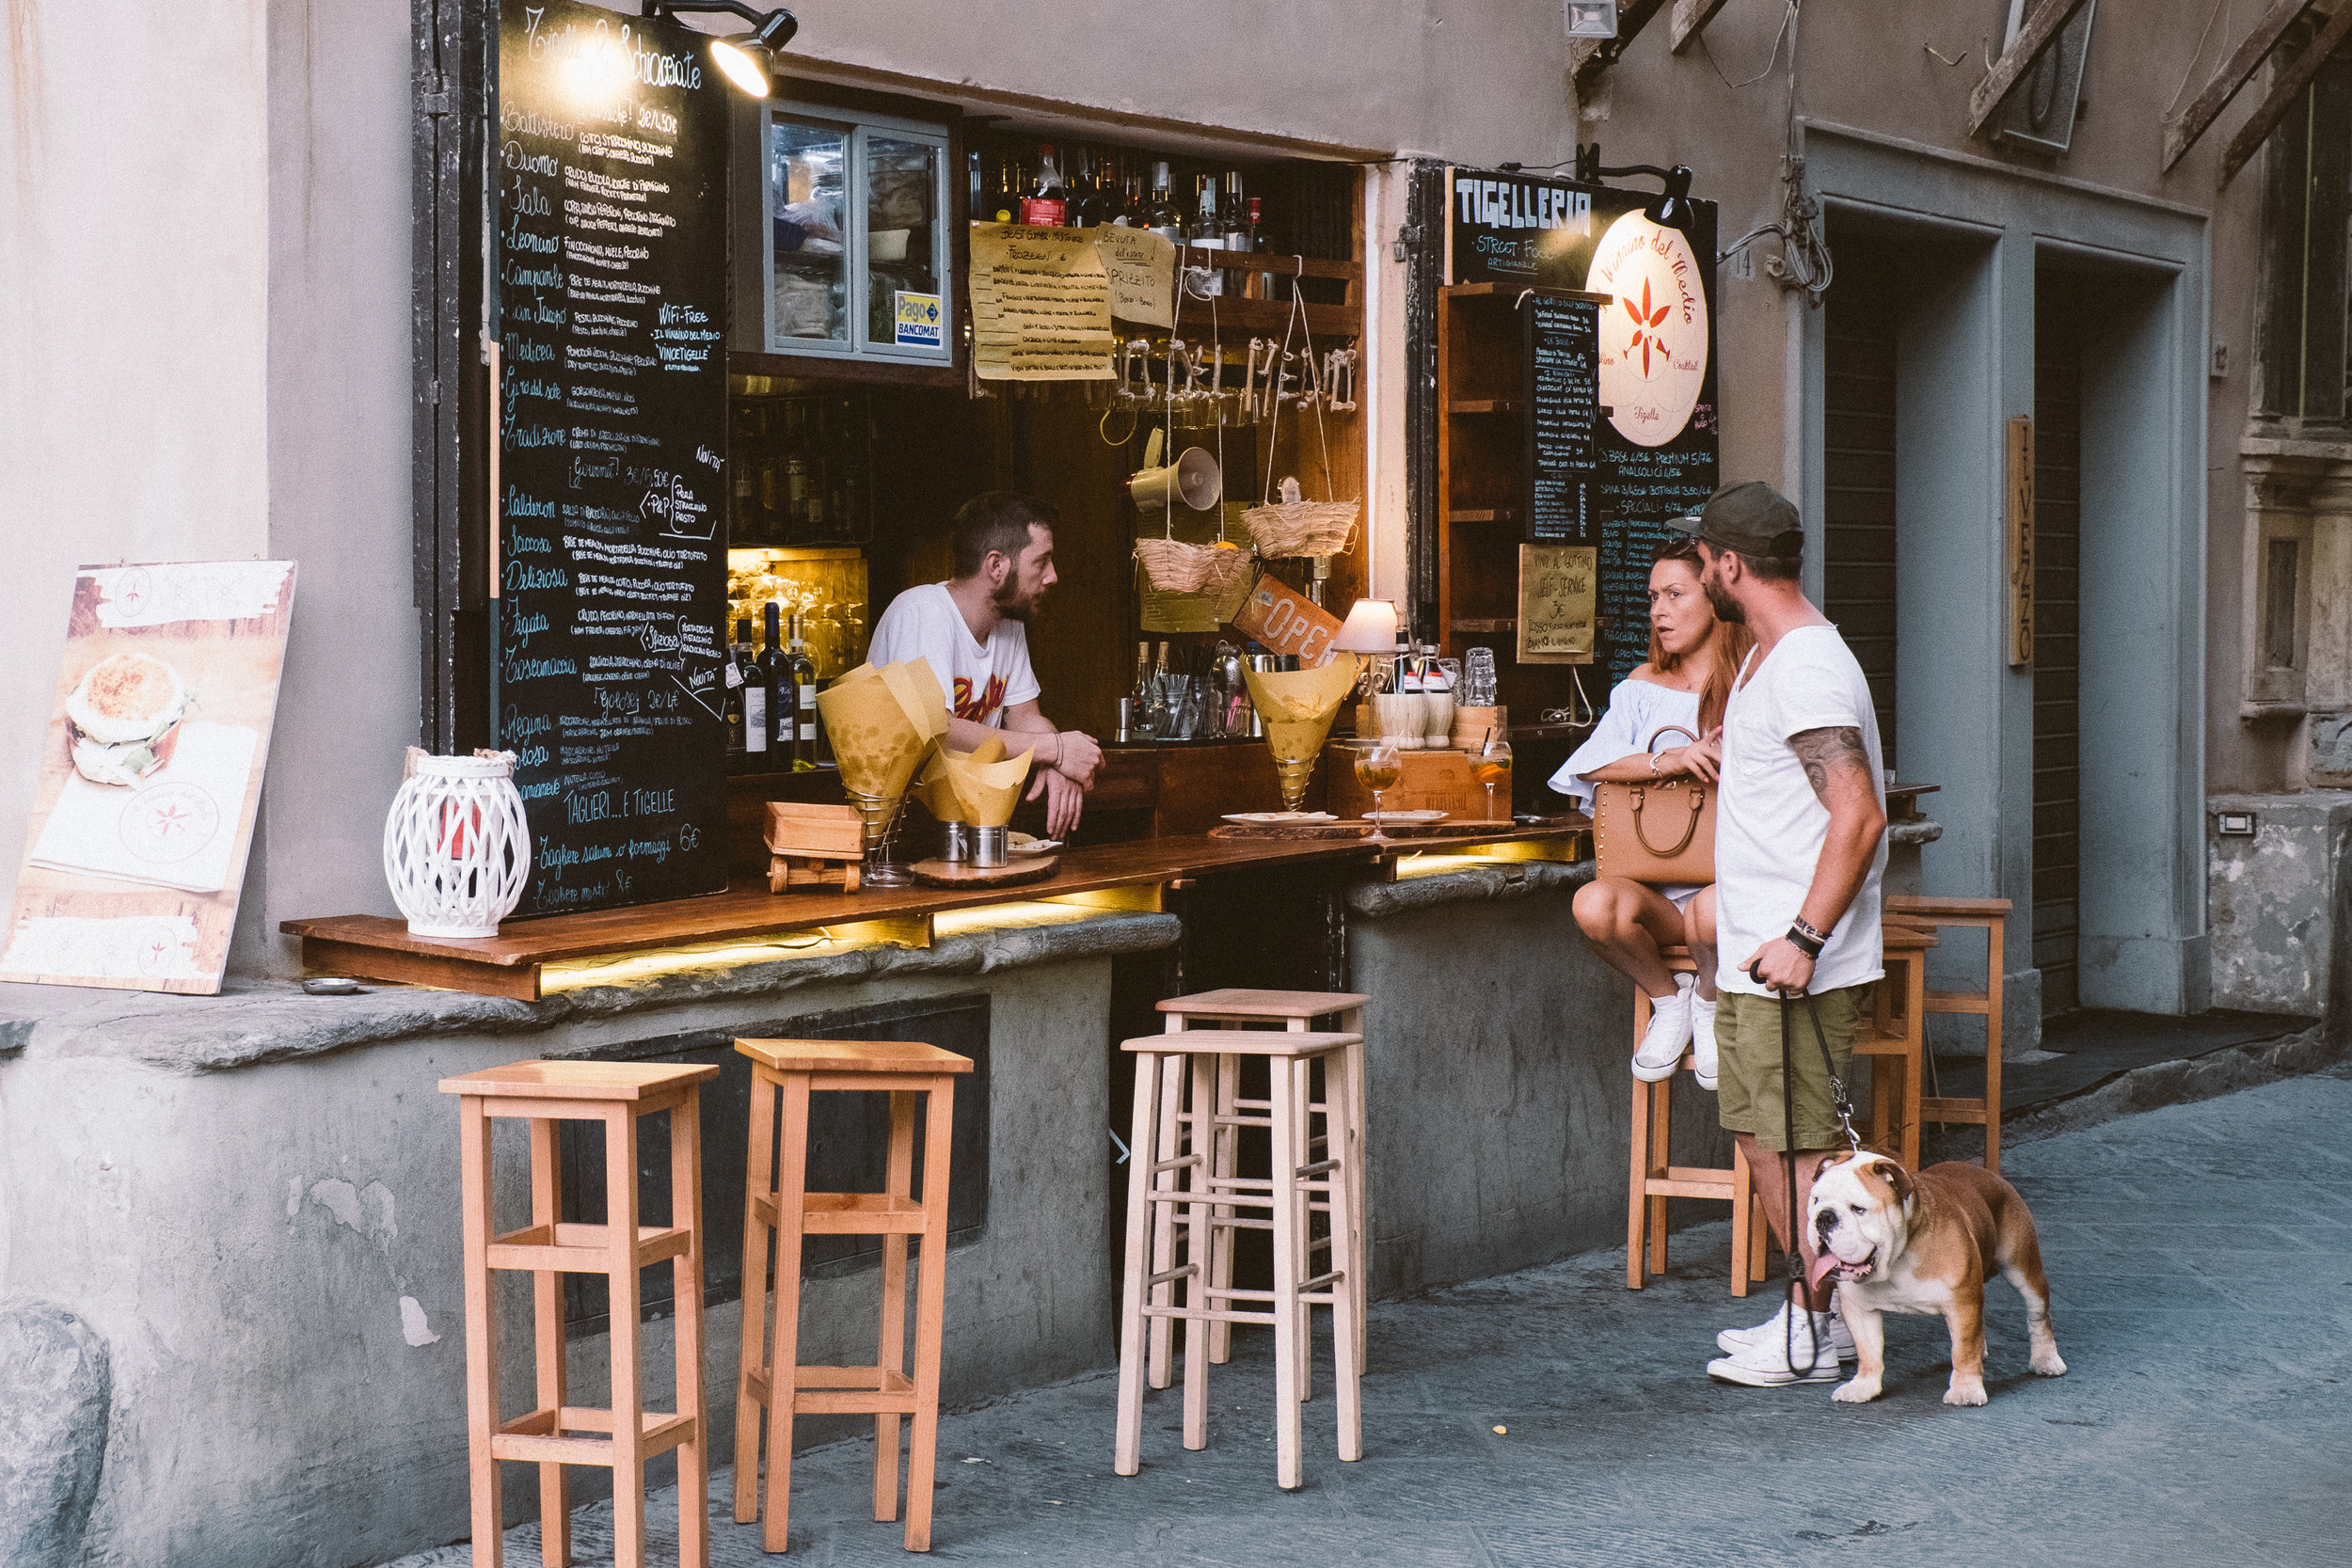 fat-creative-travel-blog-pistoia-italian-capital-of-culture-2017-62.jpg